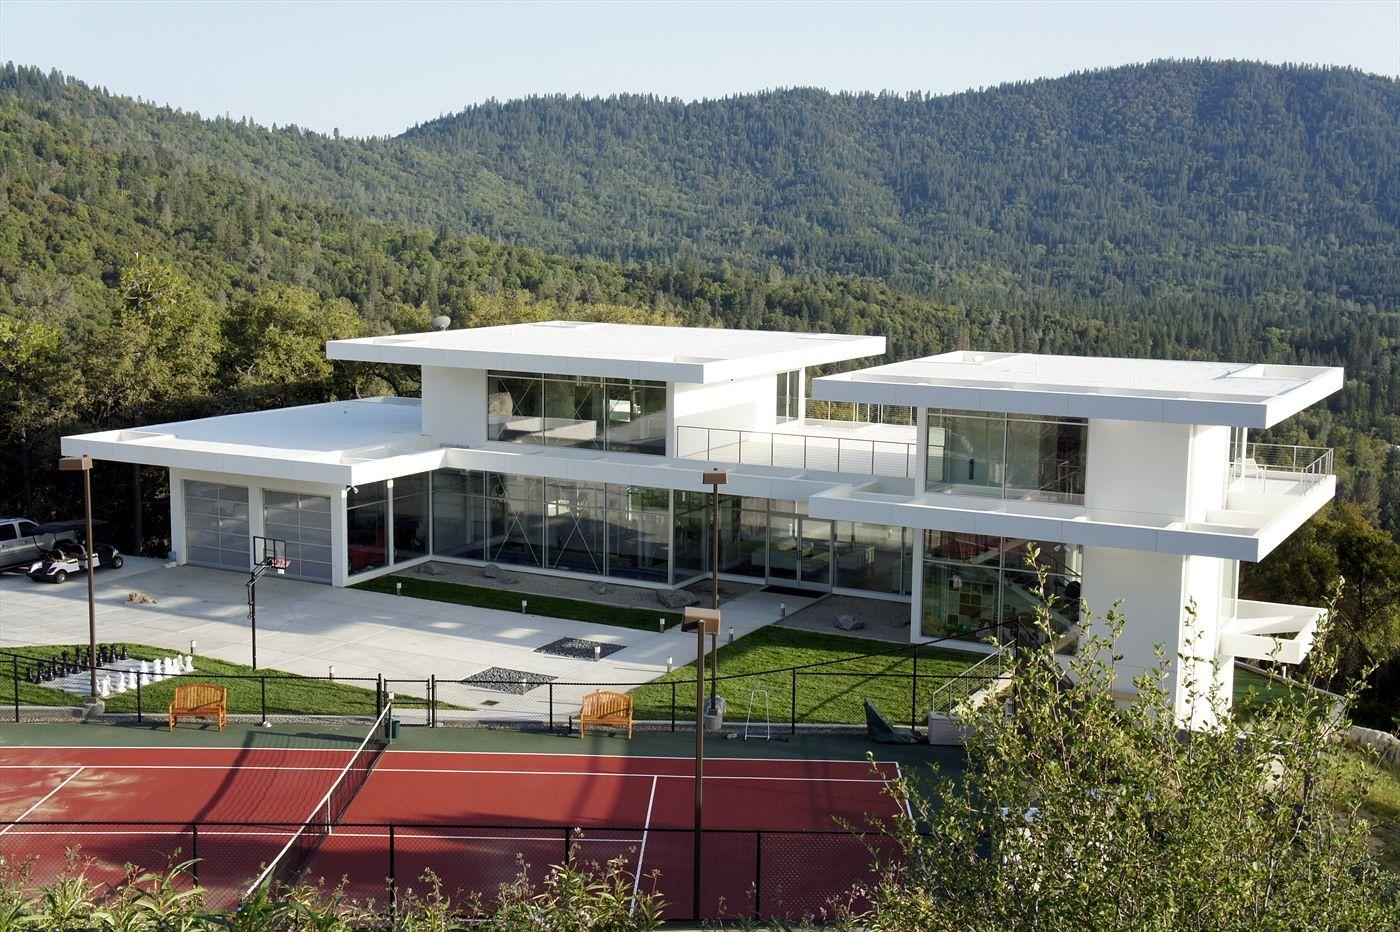 25 Amazing Modern Glass House Design Modern Glass House Modern House Plans Glass House Design